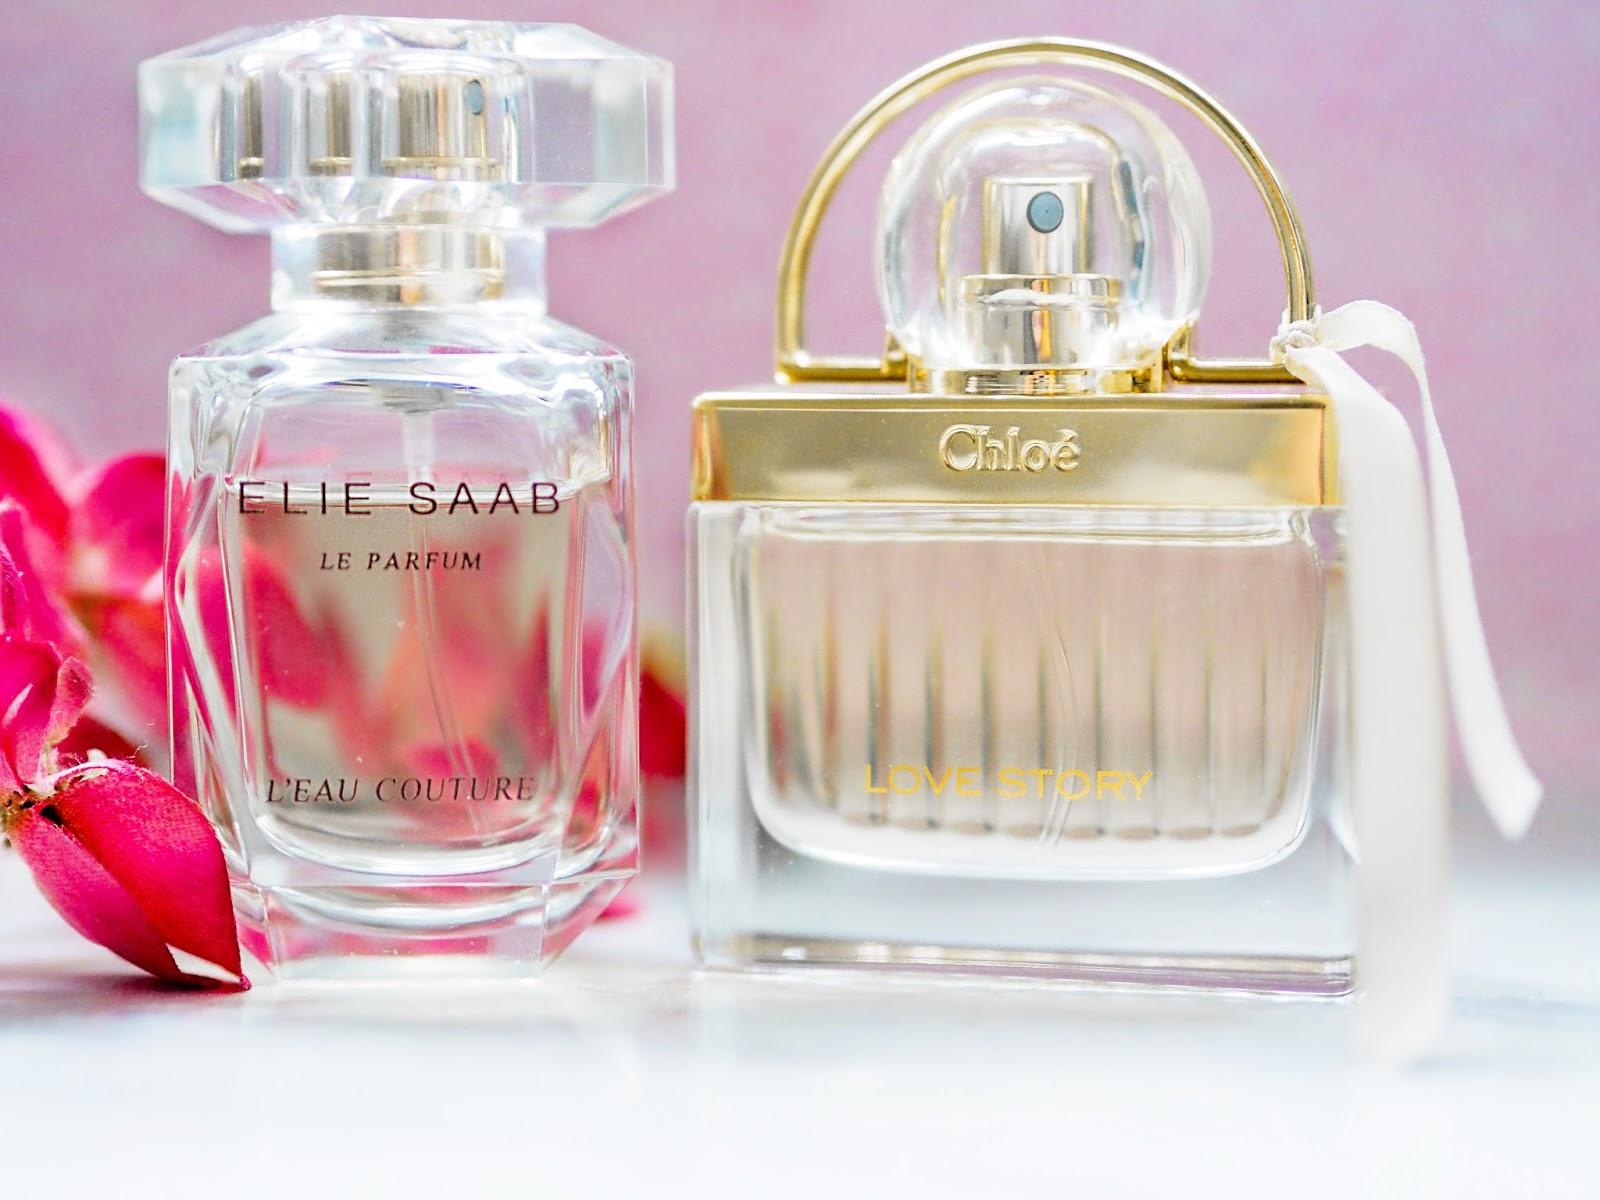 Elie Saab L'Eau Couture Chloe Love Story